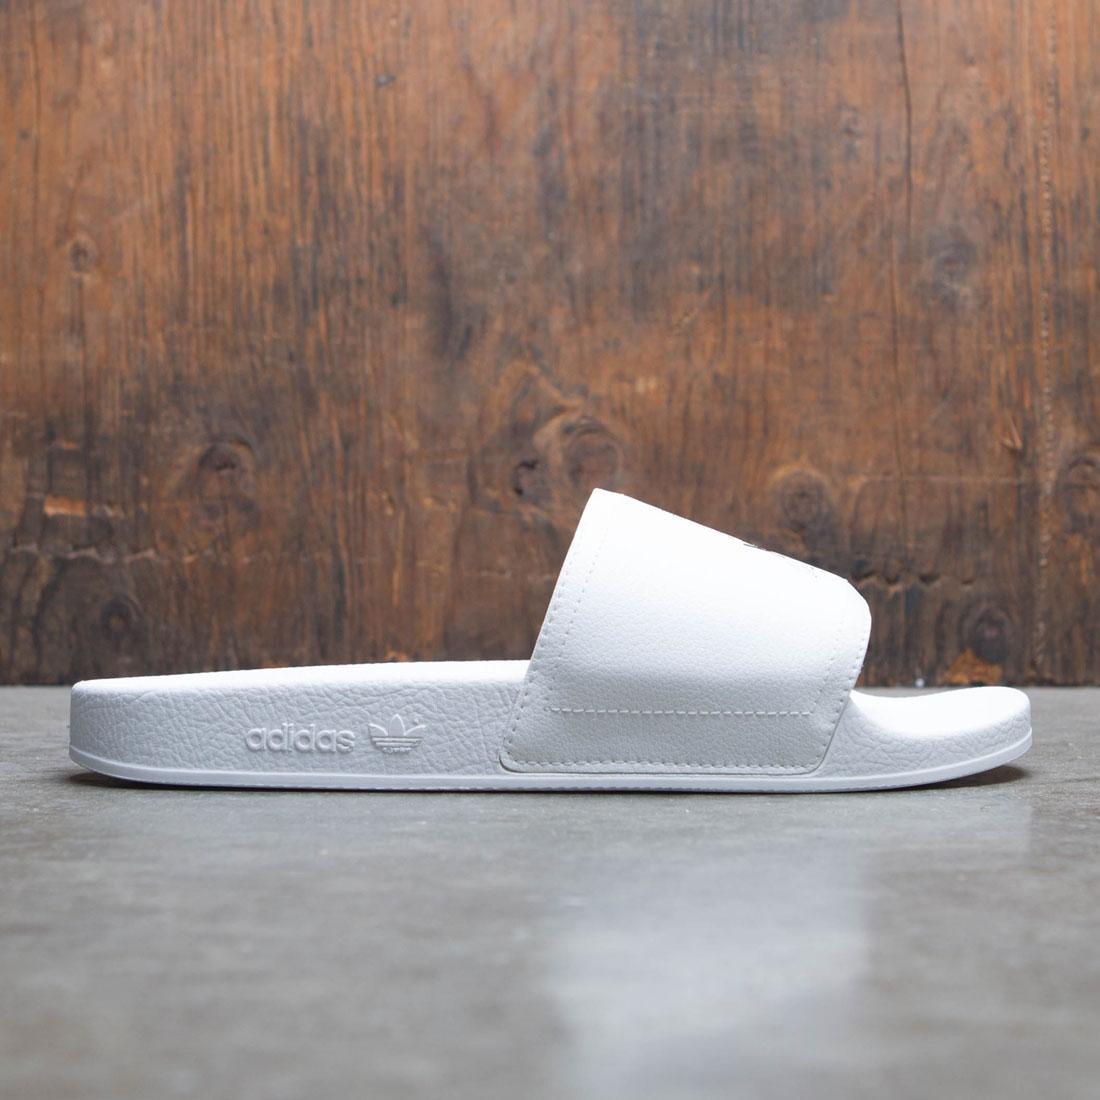 Adidas Y-3 Men Adilette (white / core black / footwear white)